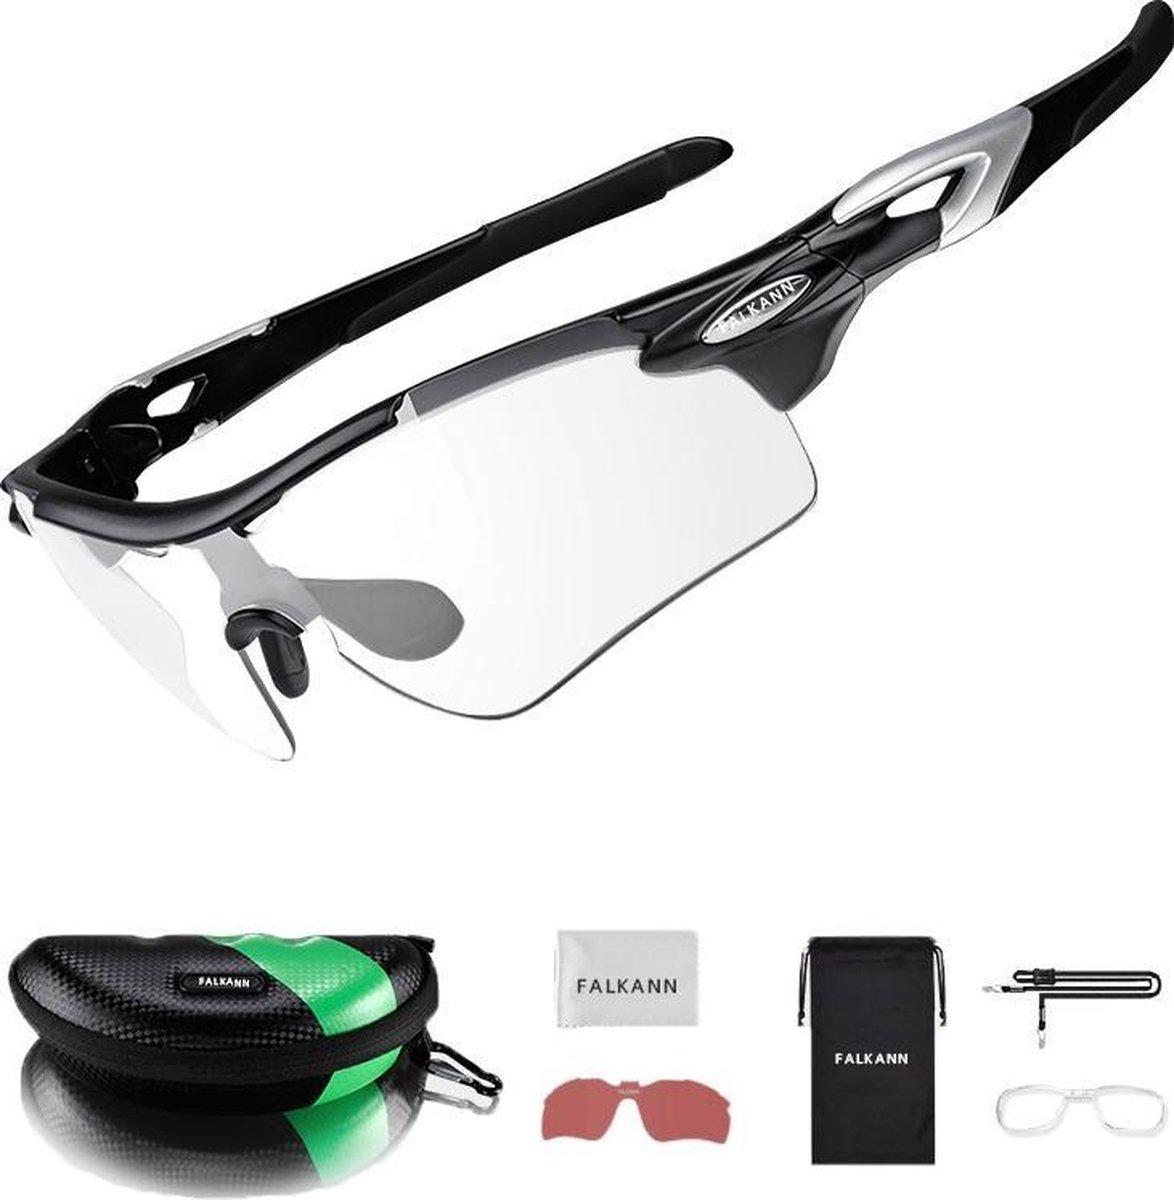 Falkann Fietsbril / Sportbril Zwart - Gepolariseerde & Meekleurende Glazen